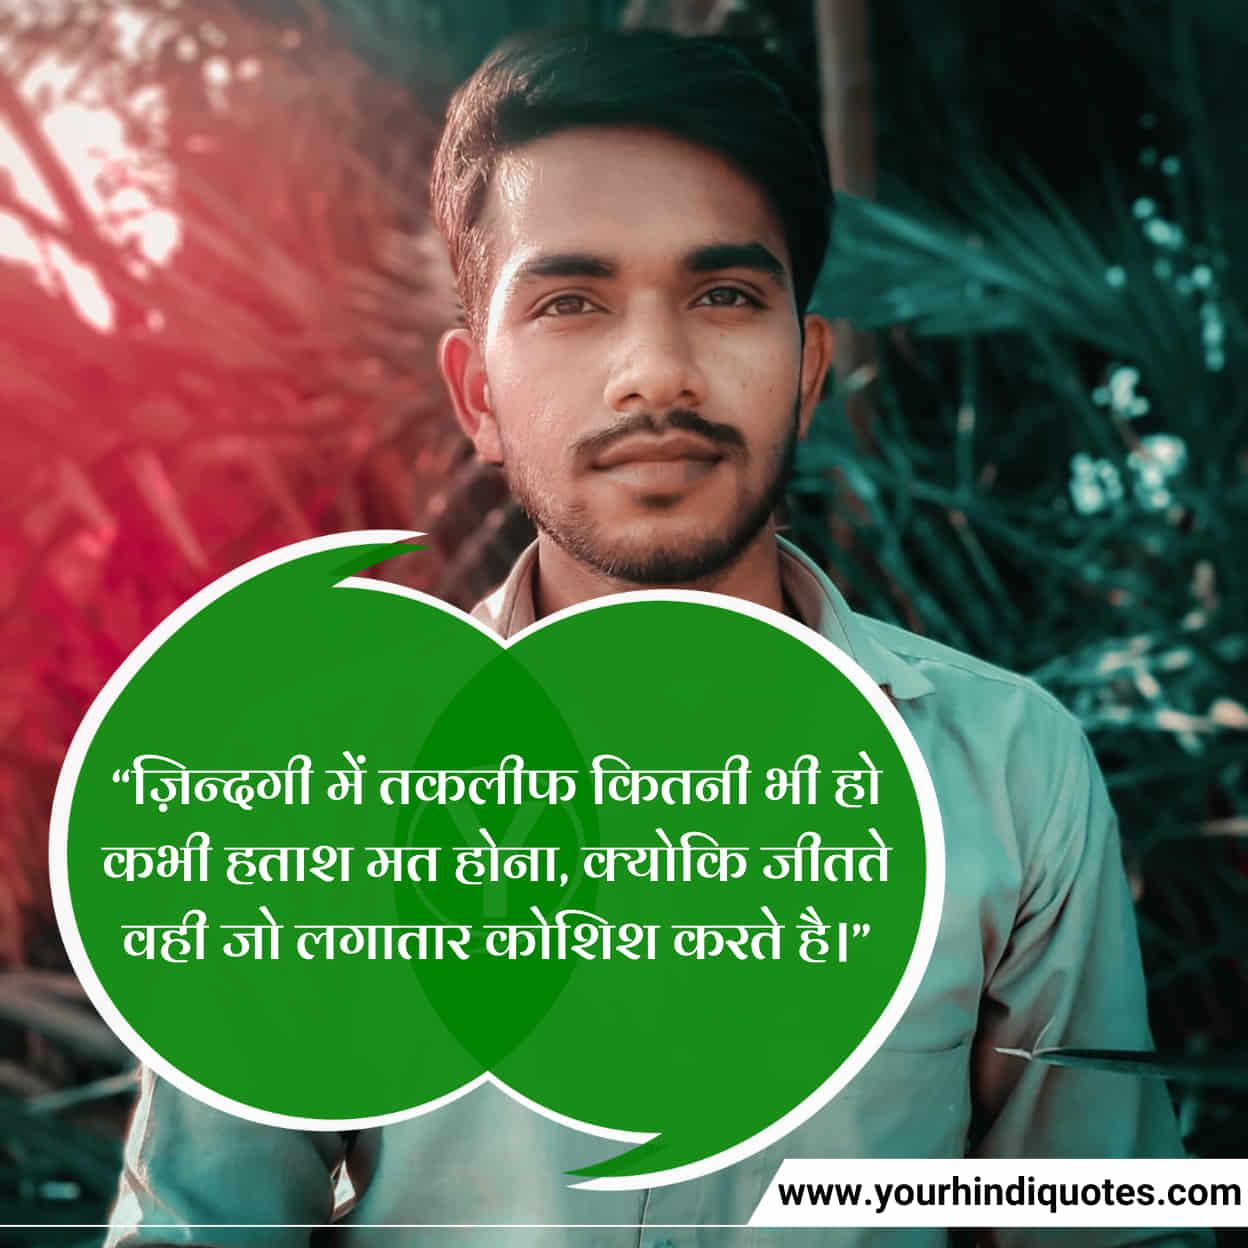 Inspirational Hindi Quotes For Students In Hindi